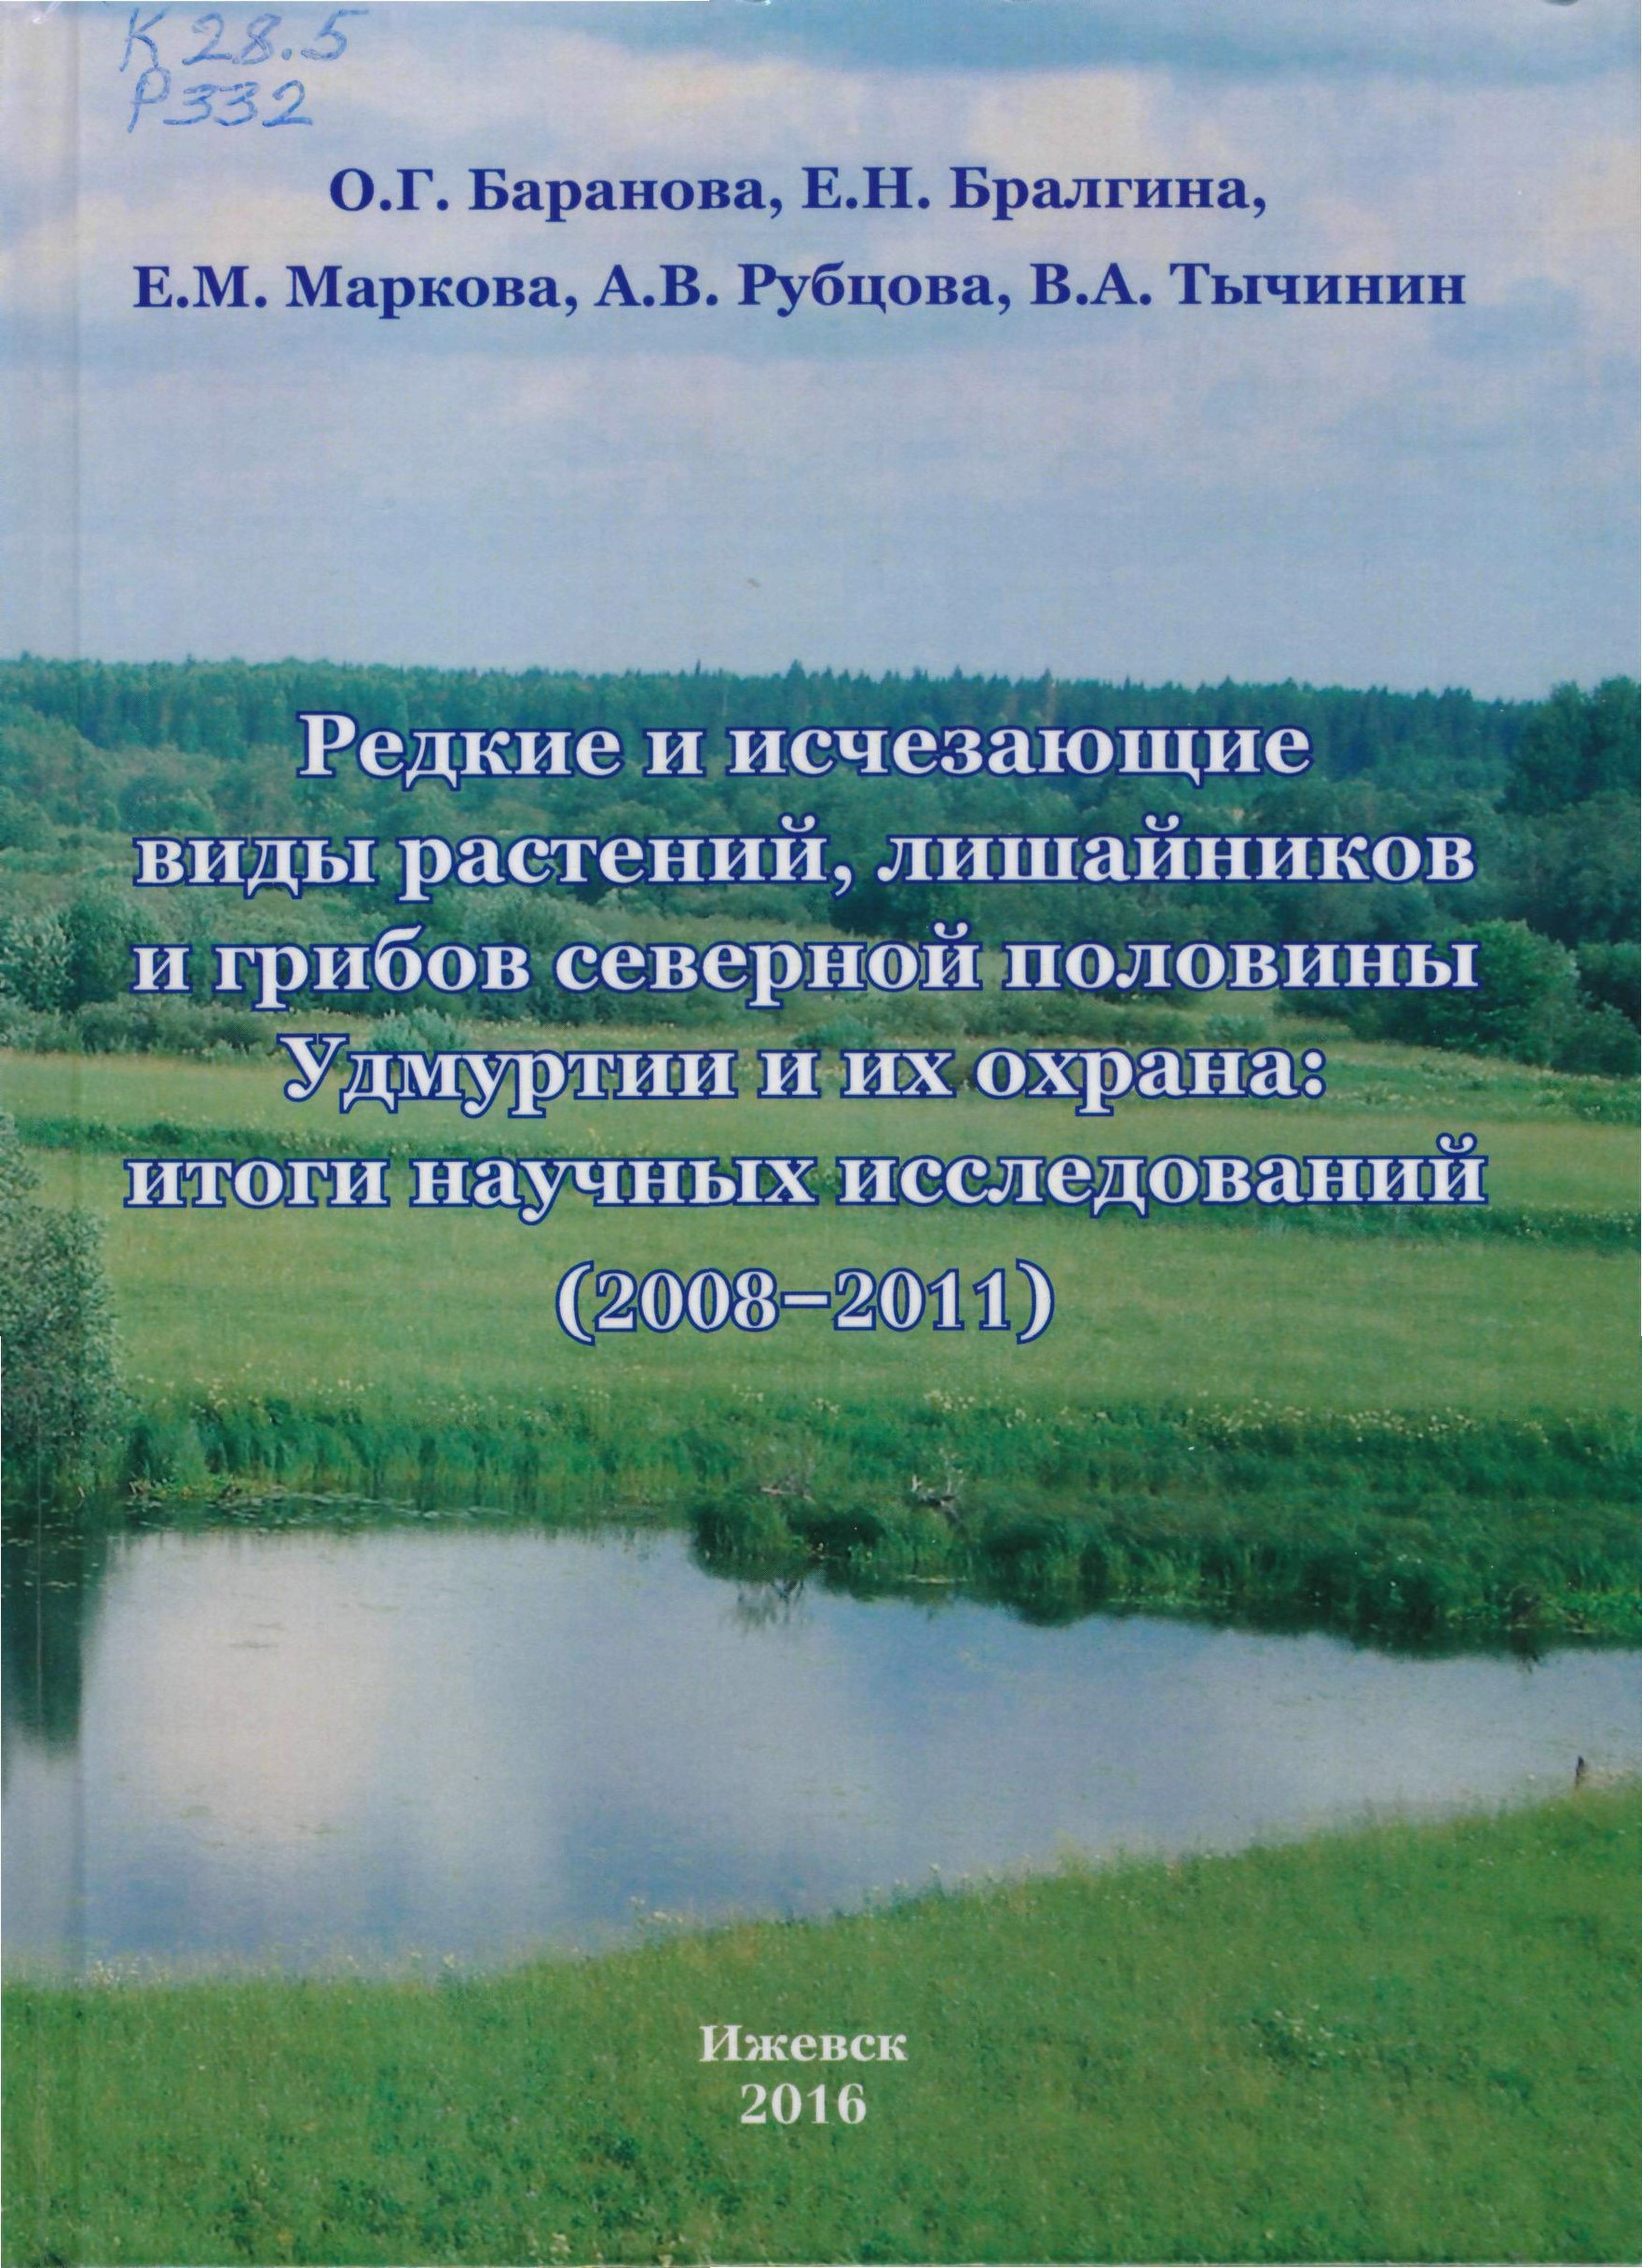 Доклад о природе удмуртии 7366